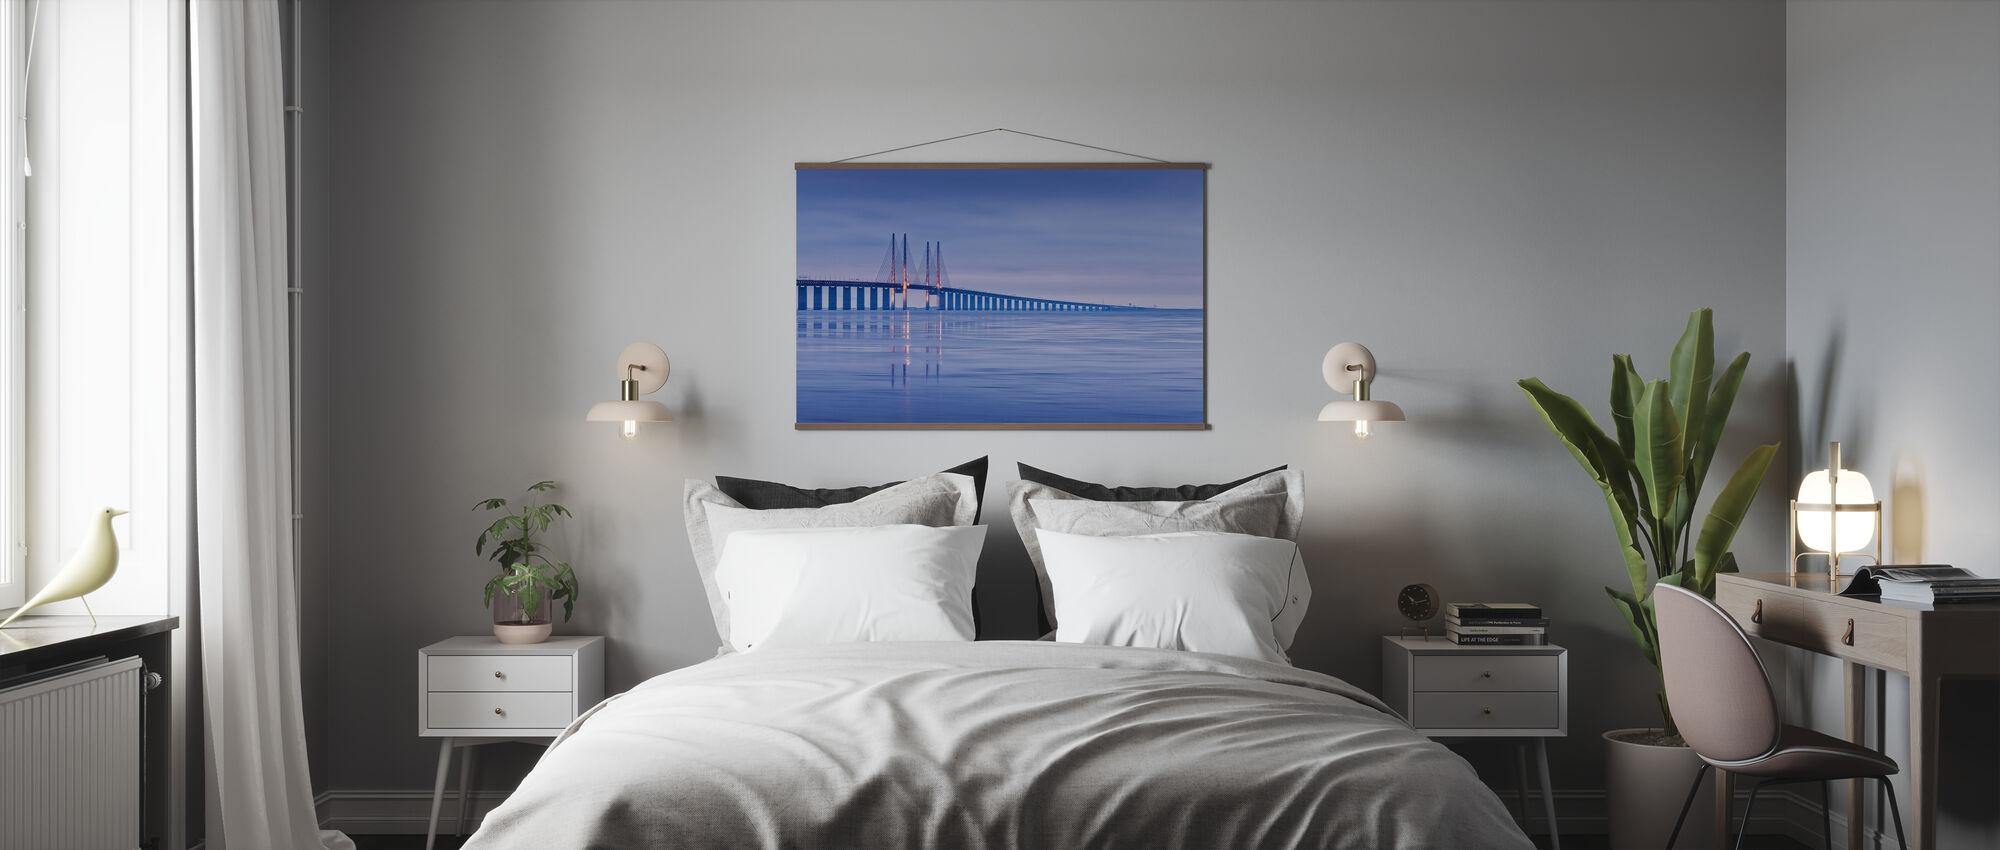 Oresund Bridge - Poster - Bedroom